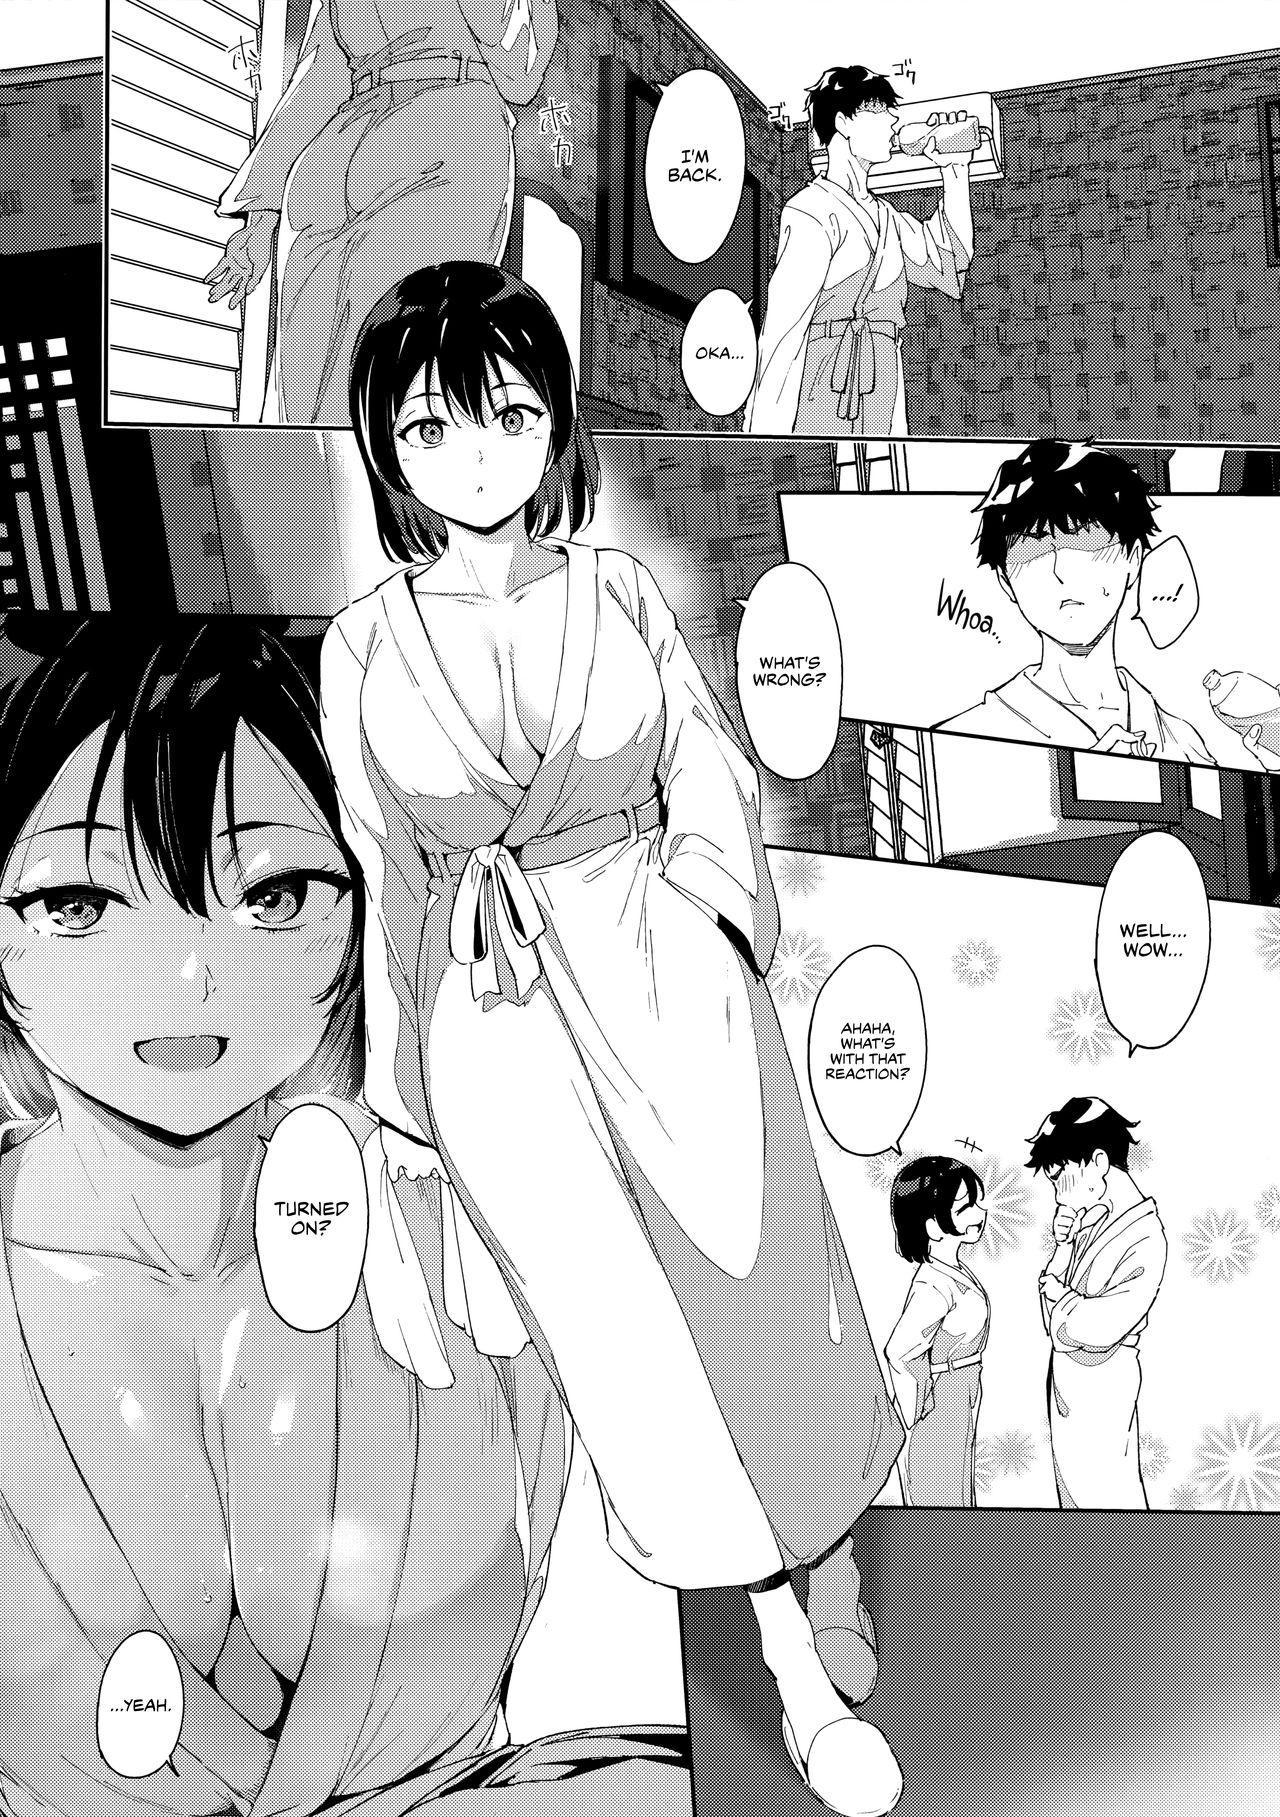 [Ringoya (Alp)] Watanabe no Kyuujitsu ~episode of Tsuki 2~ | Watanabe's Day Off ~episode of Tsuki 2~ (School Idols' Day Off Collection I) (Love Live! Sunshine!!) [English] [WataTL] 5